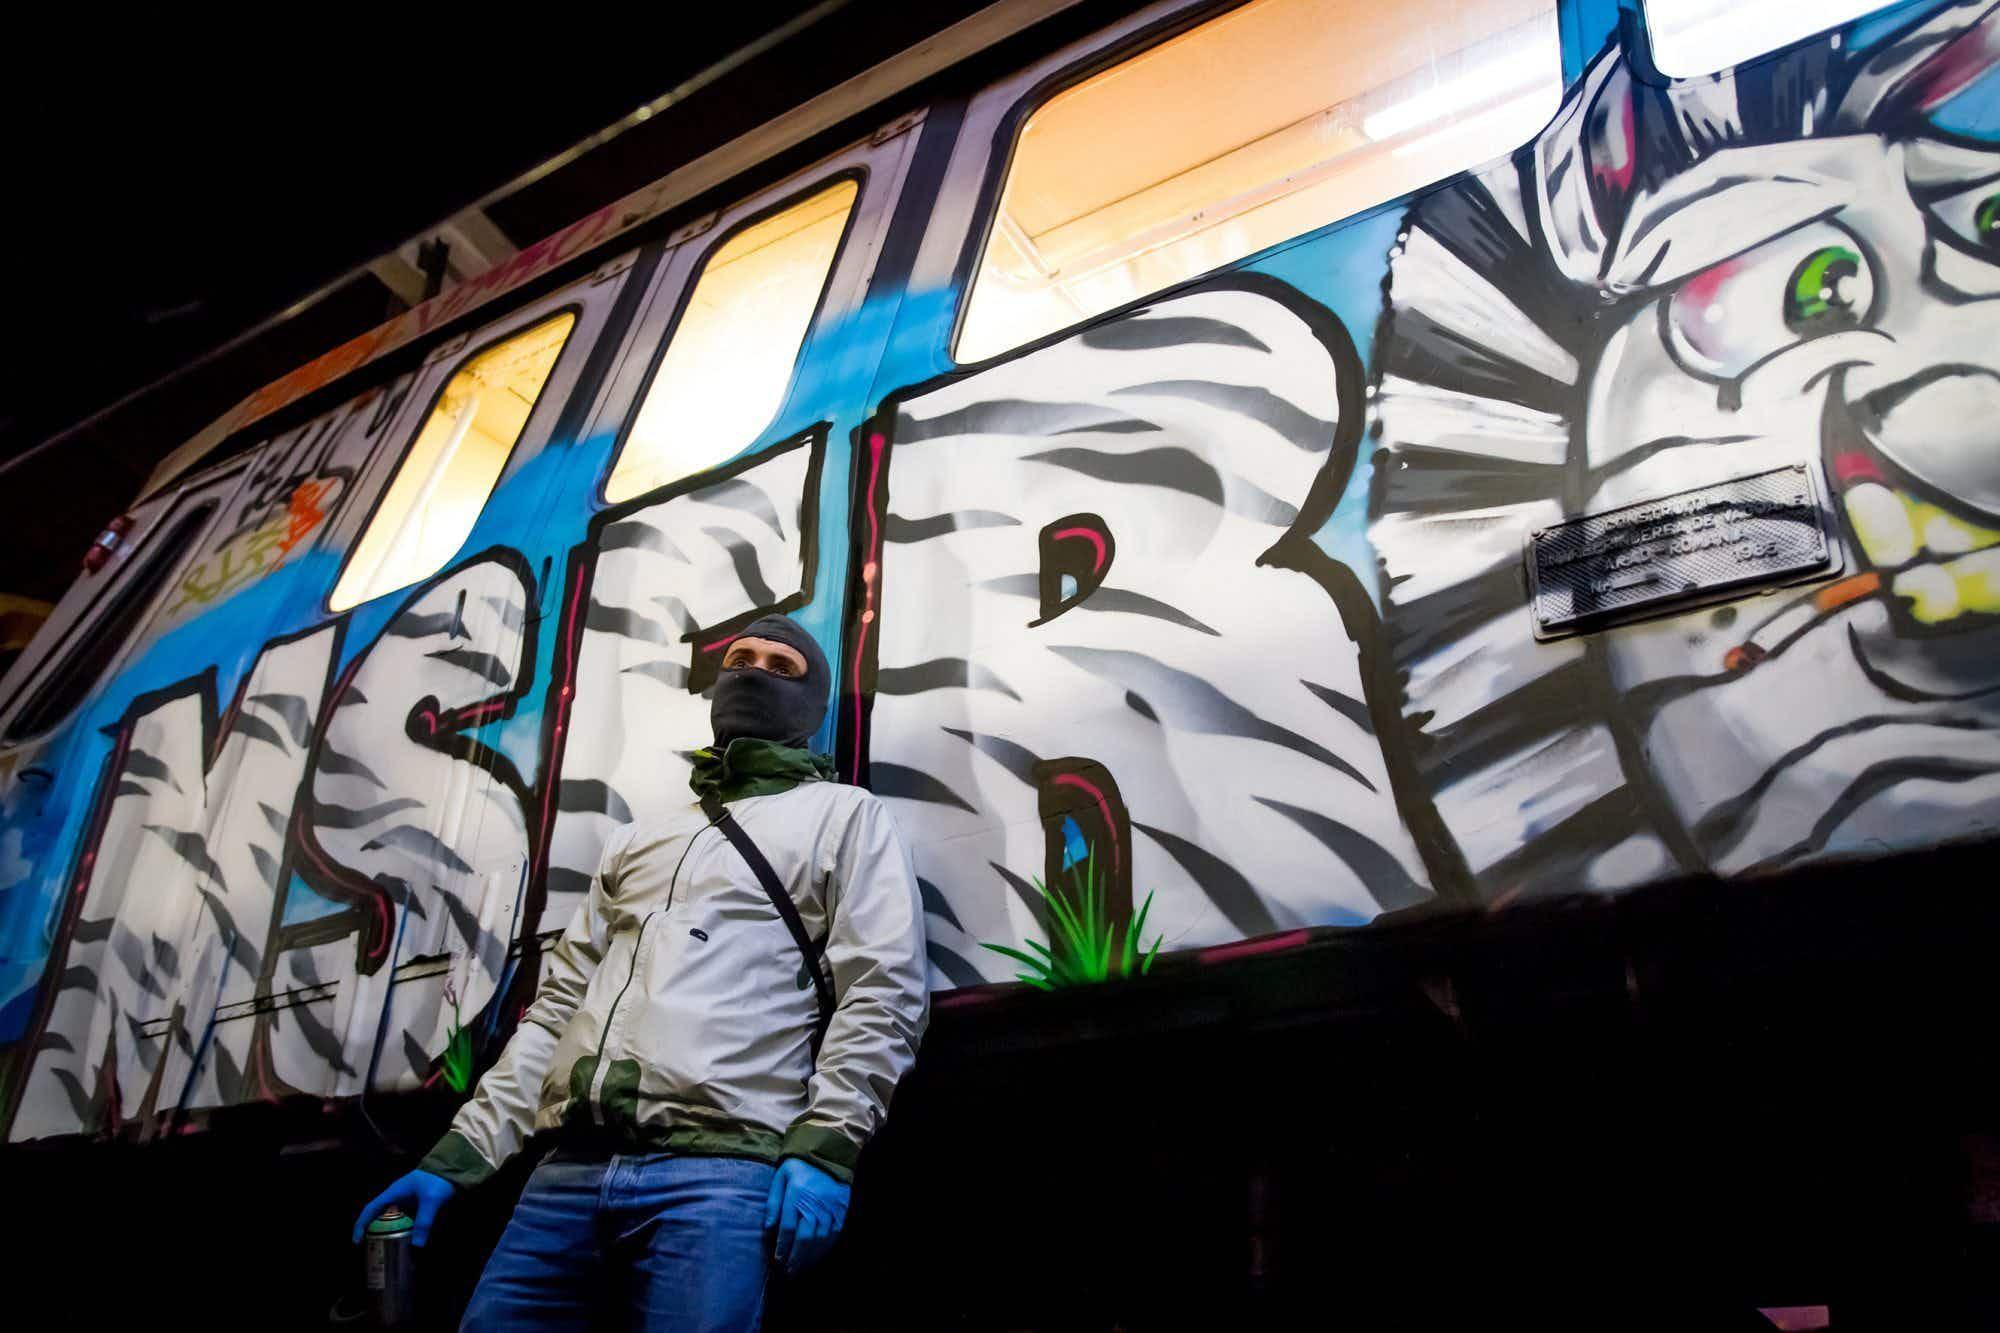 Train graffiti artists around the world unite to showcase their art form